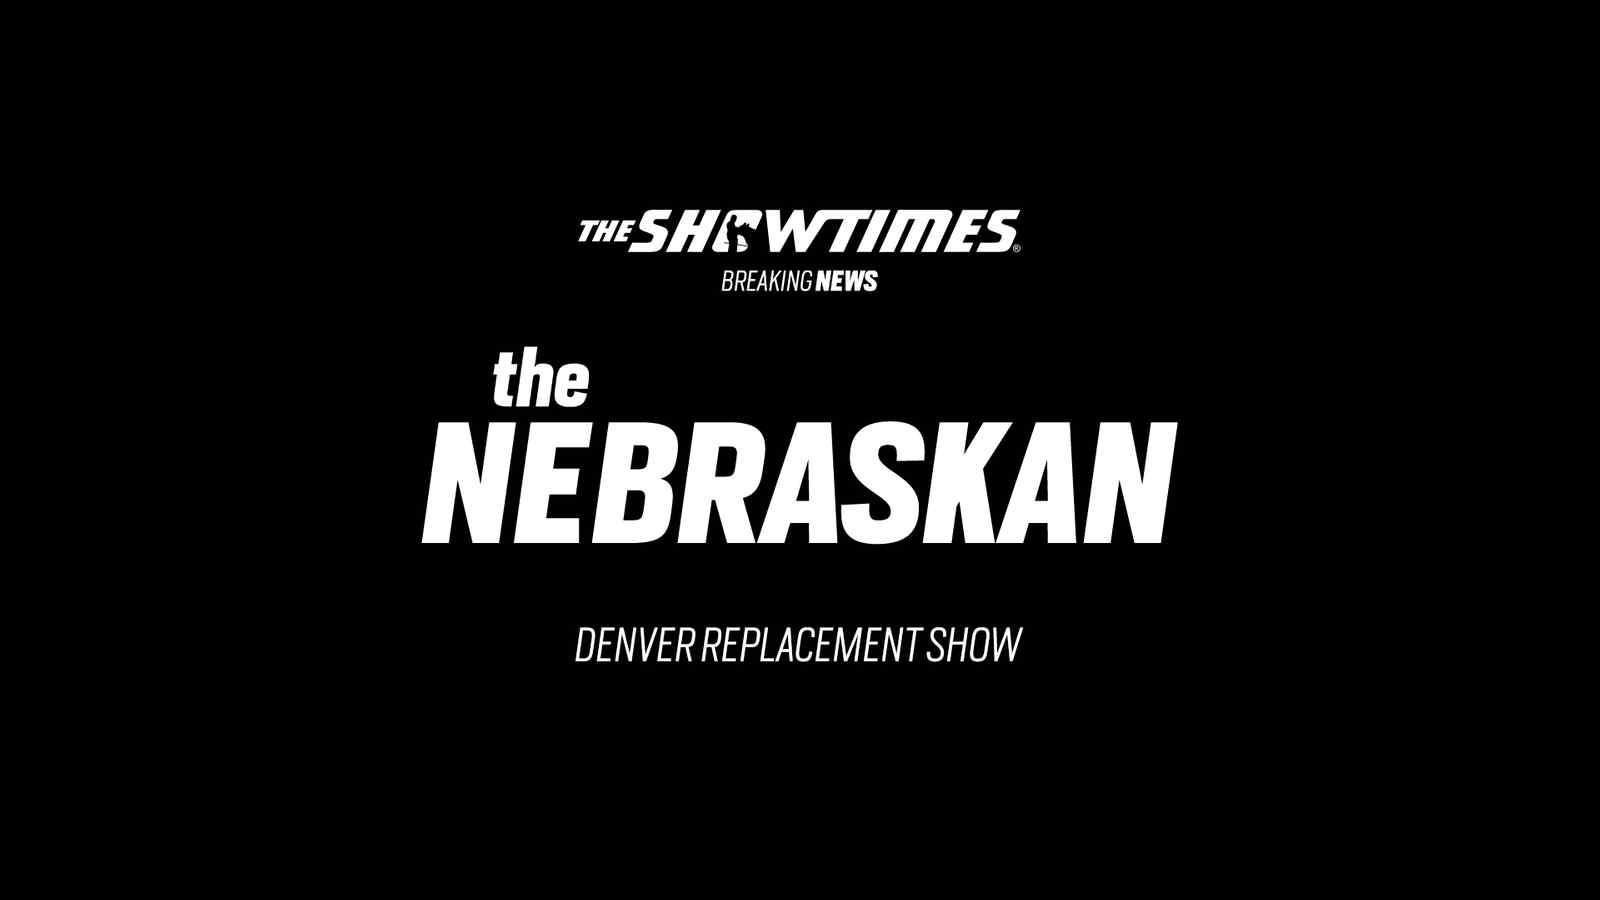 The Nebraskan Denver Replacement Show